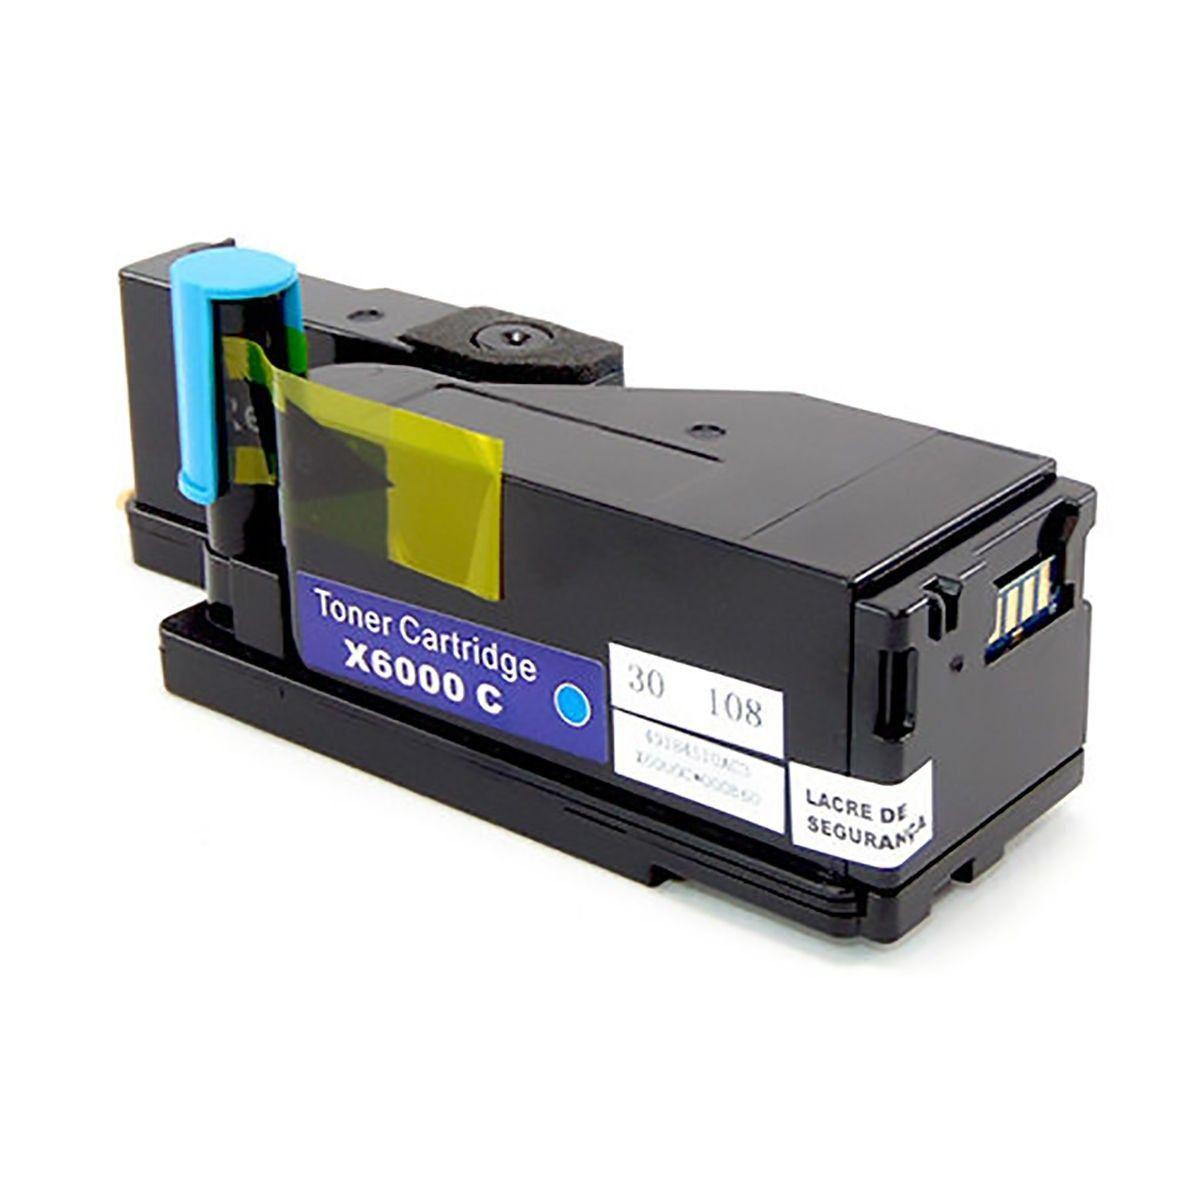 Compatível: Toner 106R01631 para Impressora Xerox WorkCentre 6015 6015b 6015ni Phaser 6000 6010 / Ciano / 1.000